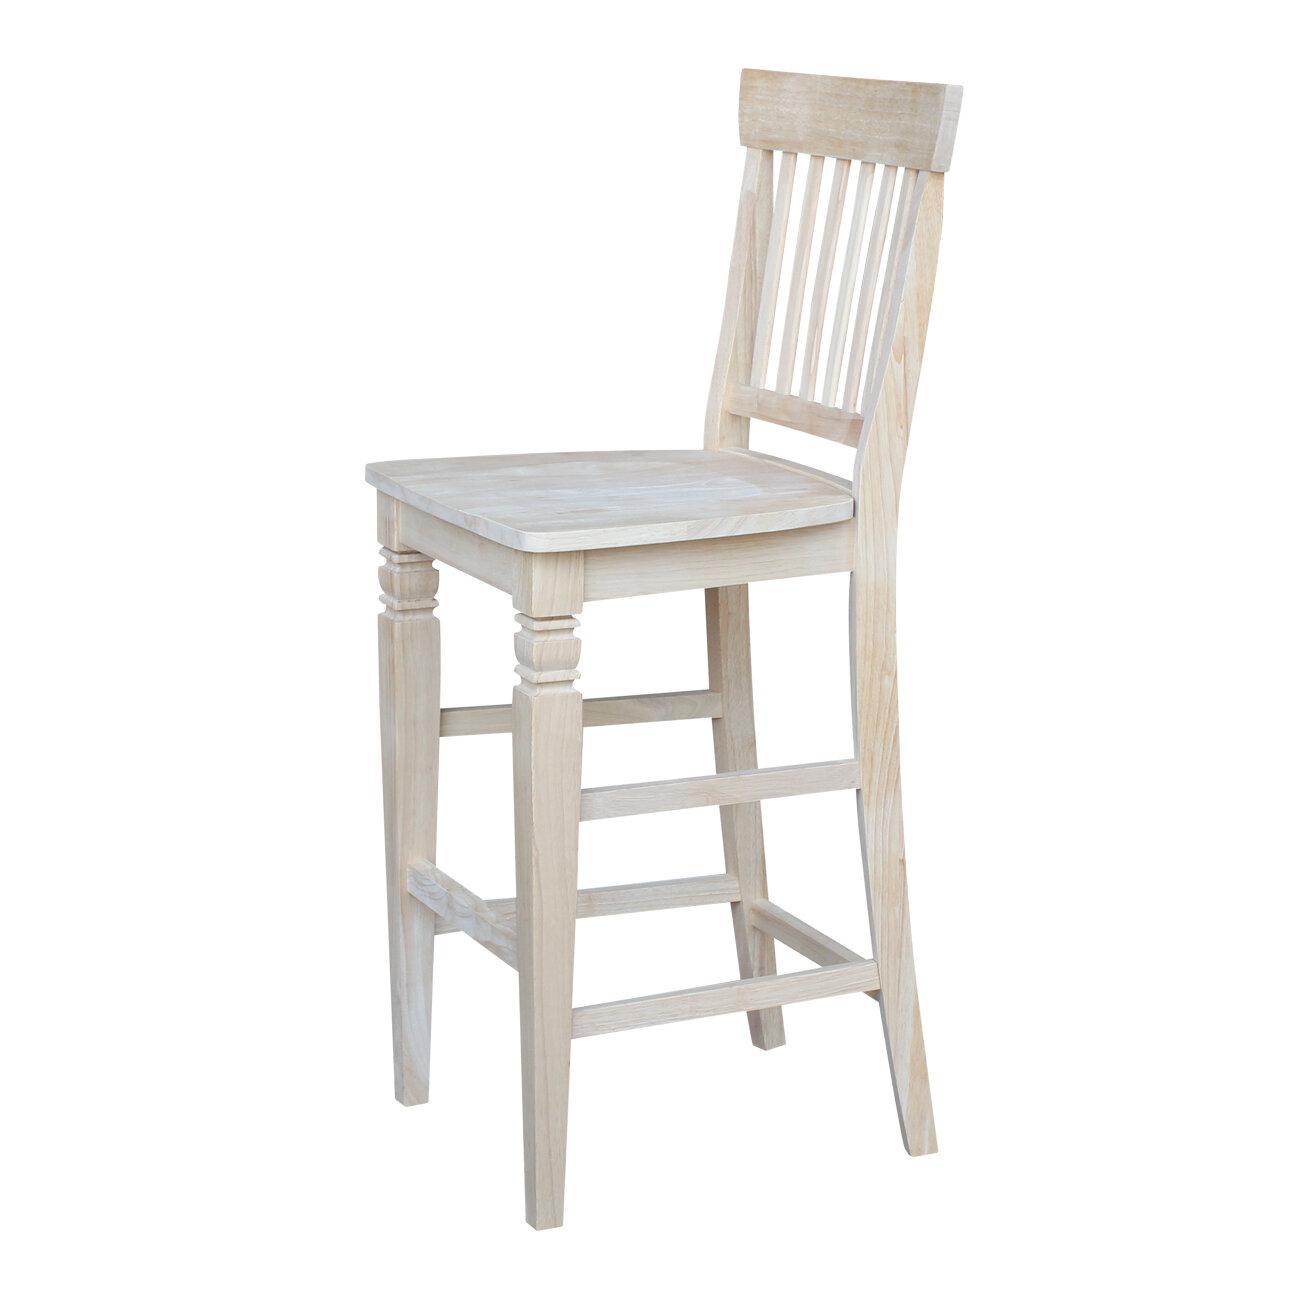 Brilliant Mayfair 30 Bar Stool Alphanode Cool Chair Designs And Ideas Alphanodeonline